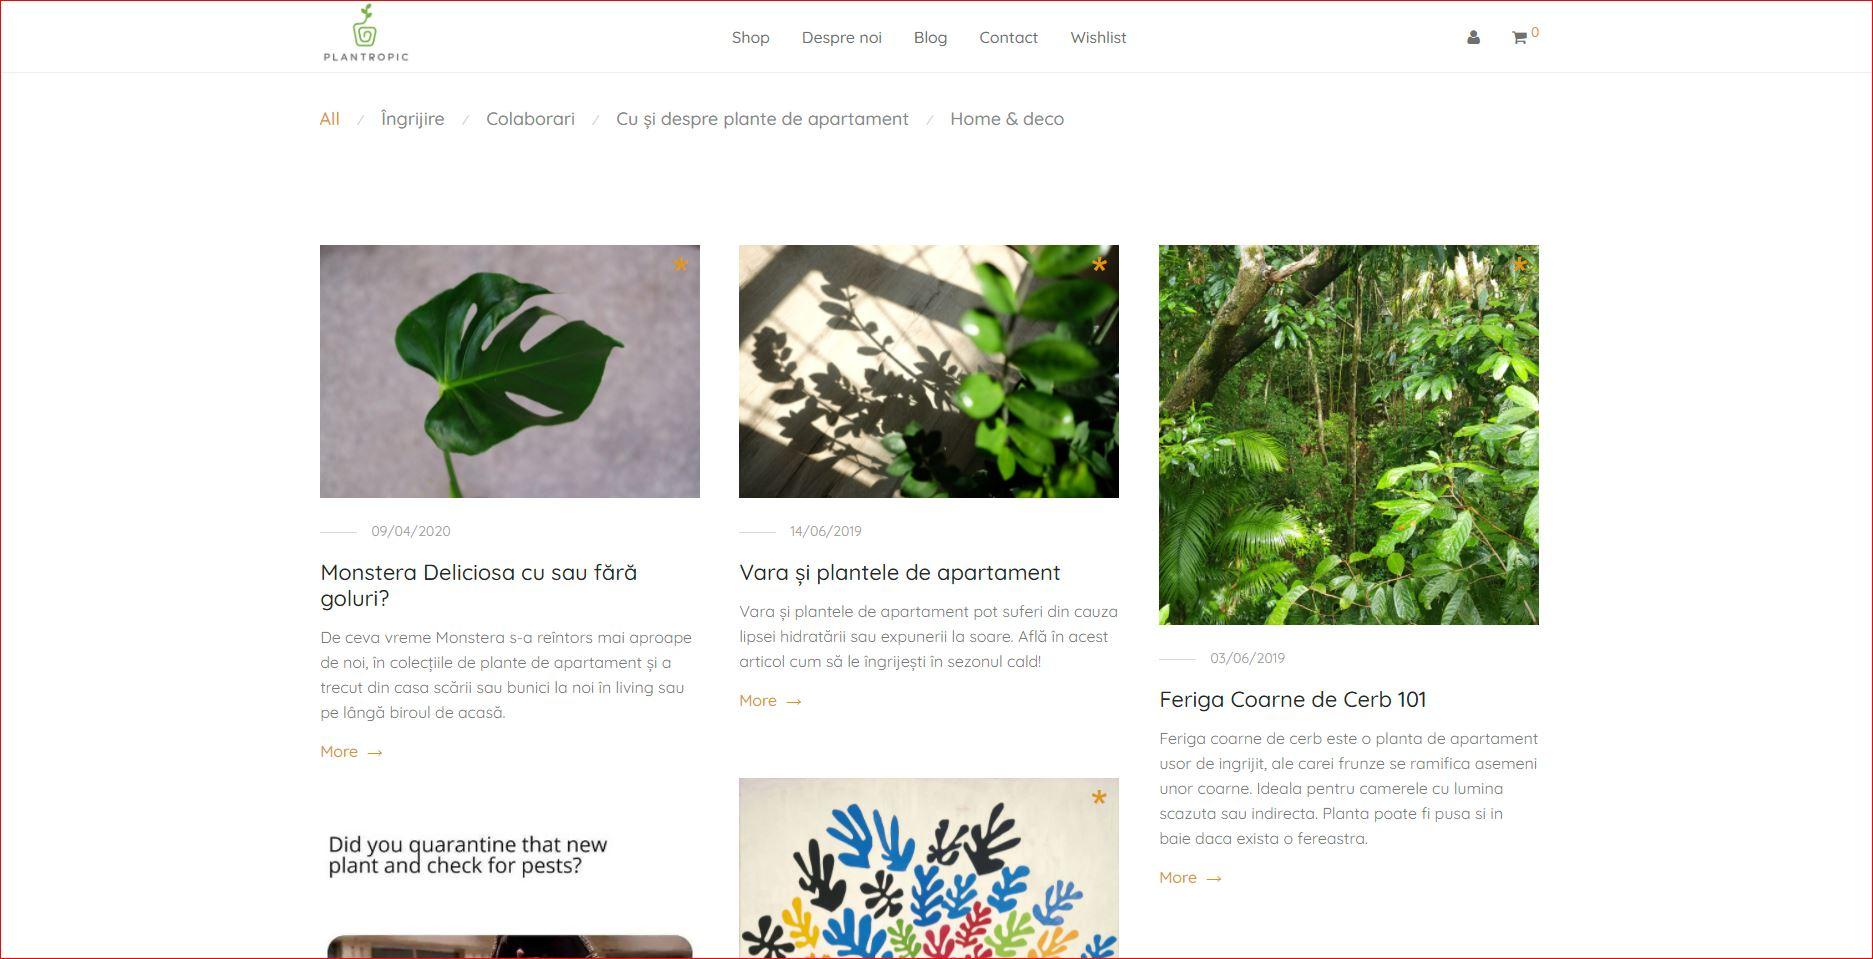 plantropic blog